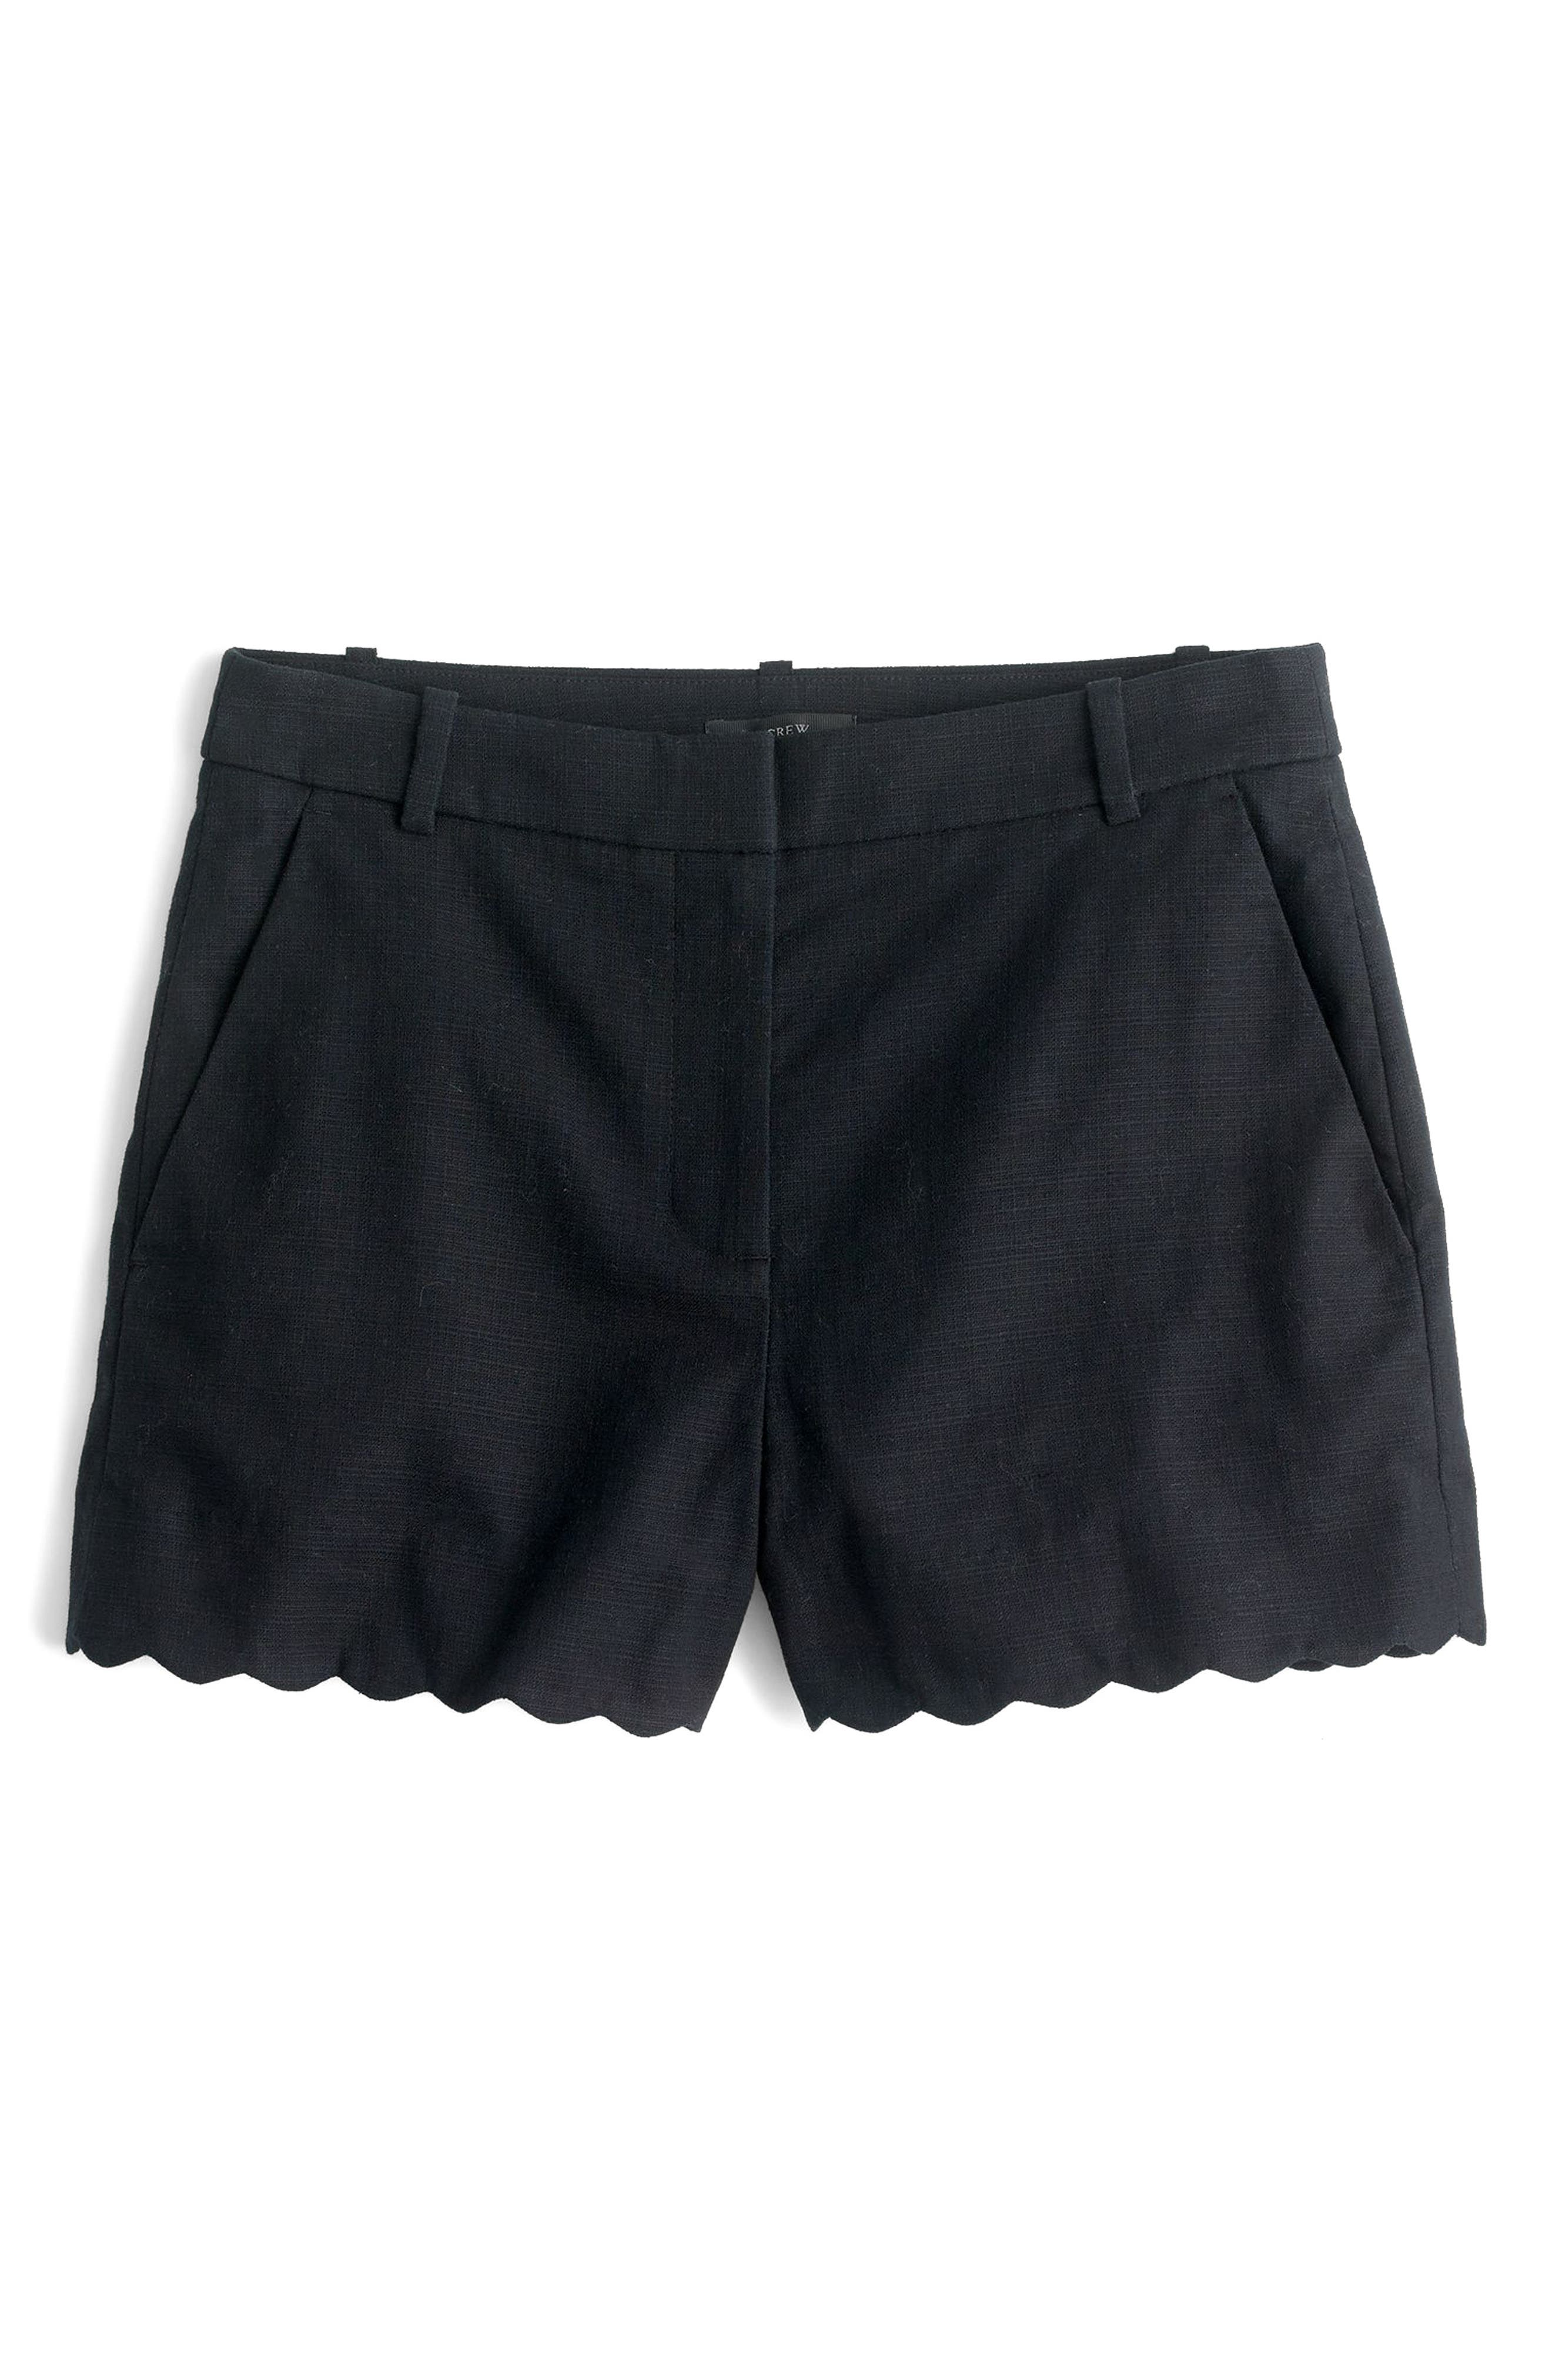 Fiesta Scallop Hem Stretch Cotton Shorts,                         Main,                         color, 001